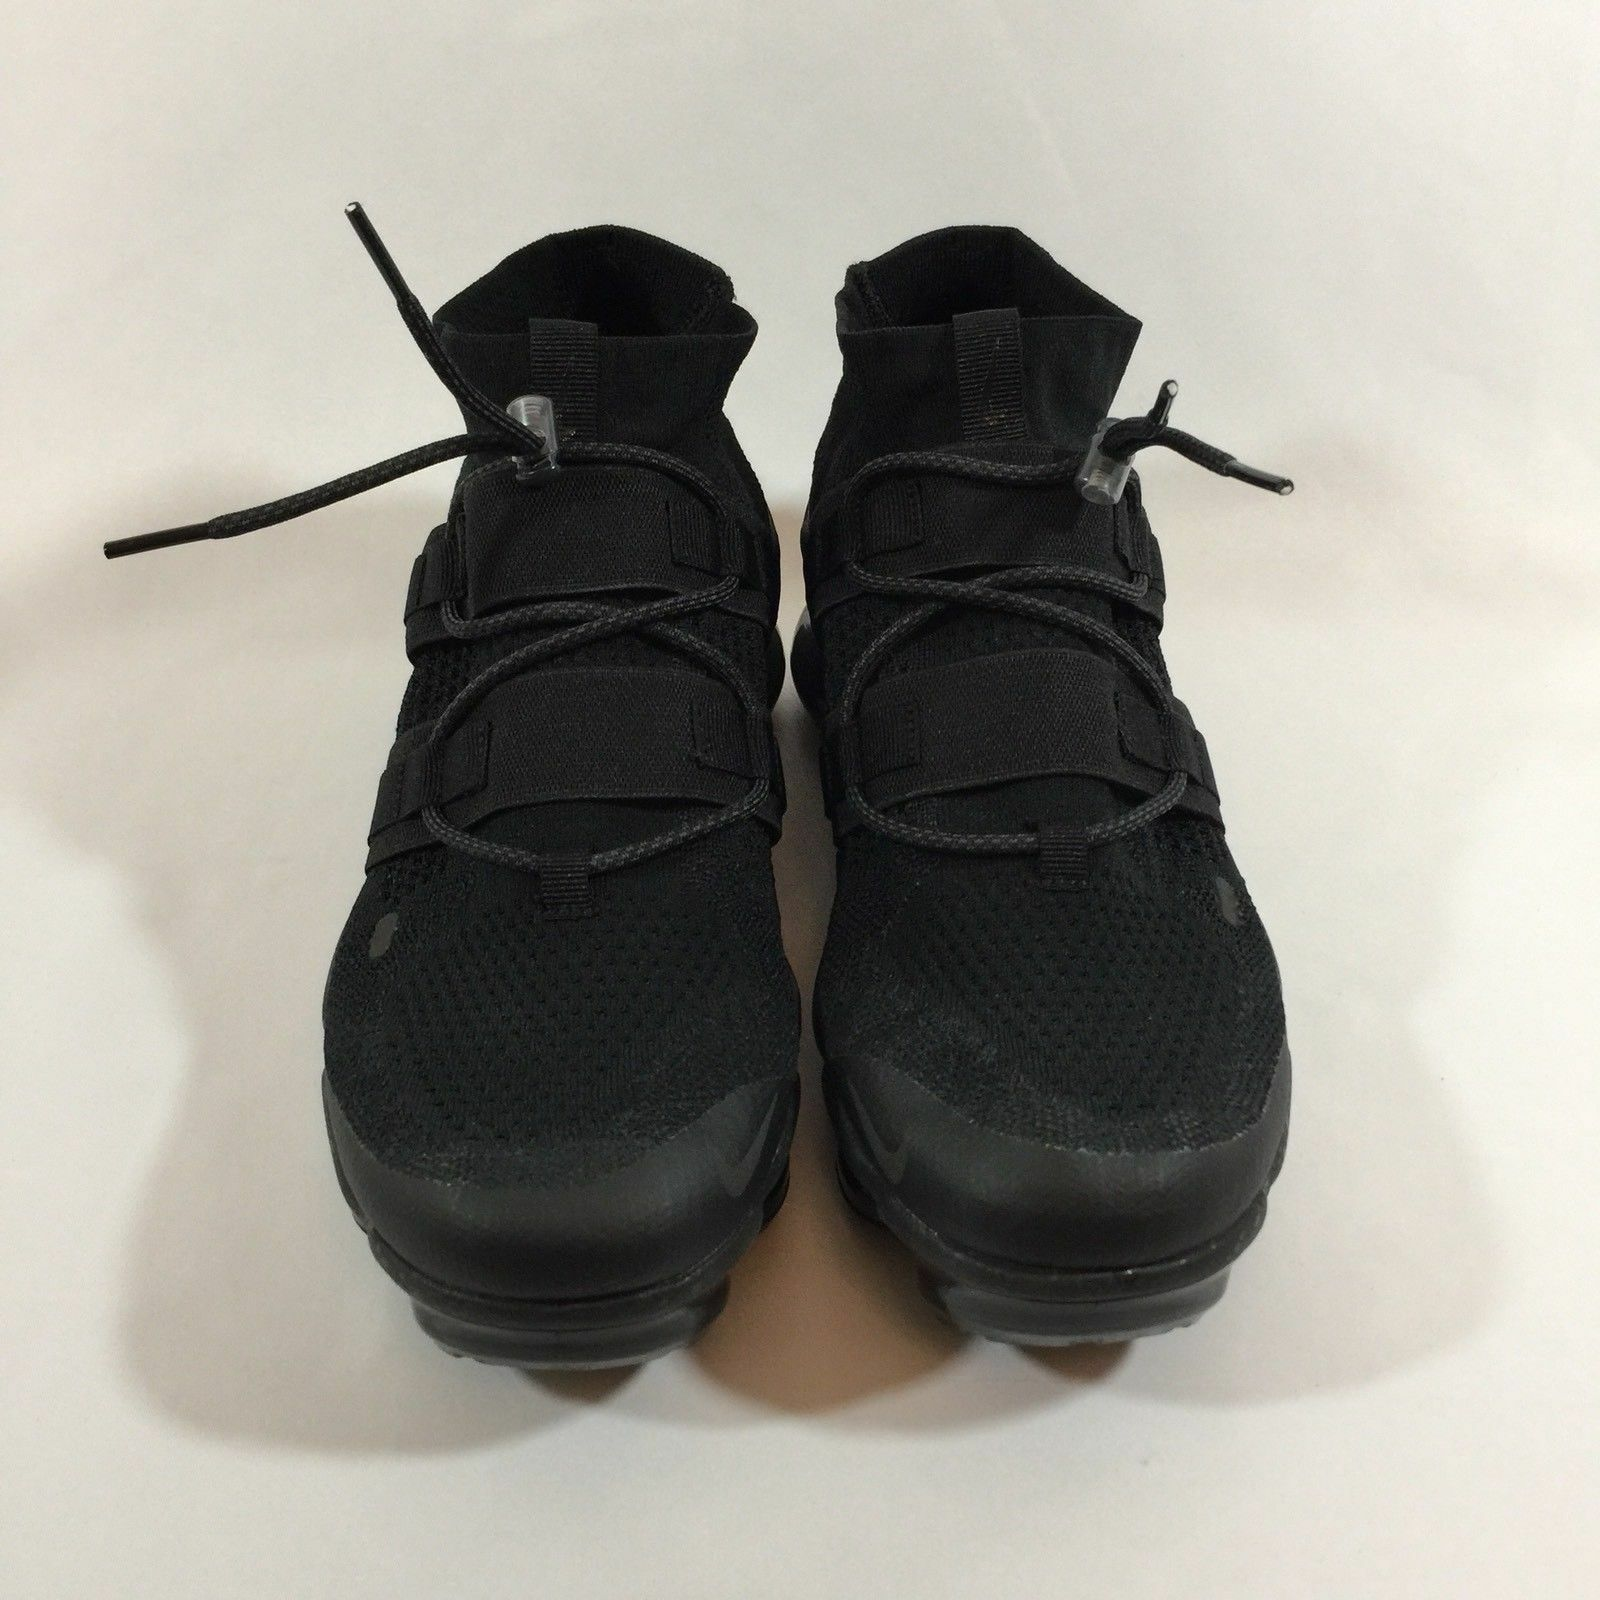 edf57a3883e8f Nike Air Vapormax Flyknit Utility Triple Black Twist ACG AH6834-001 Men Sz.  8.5